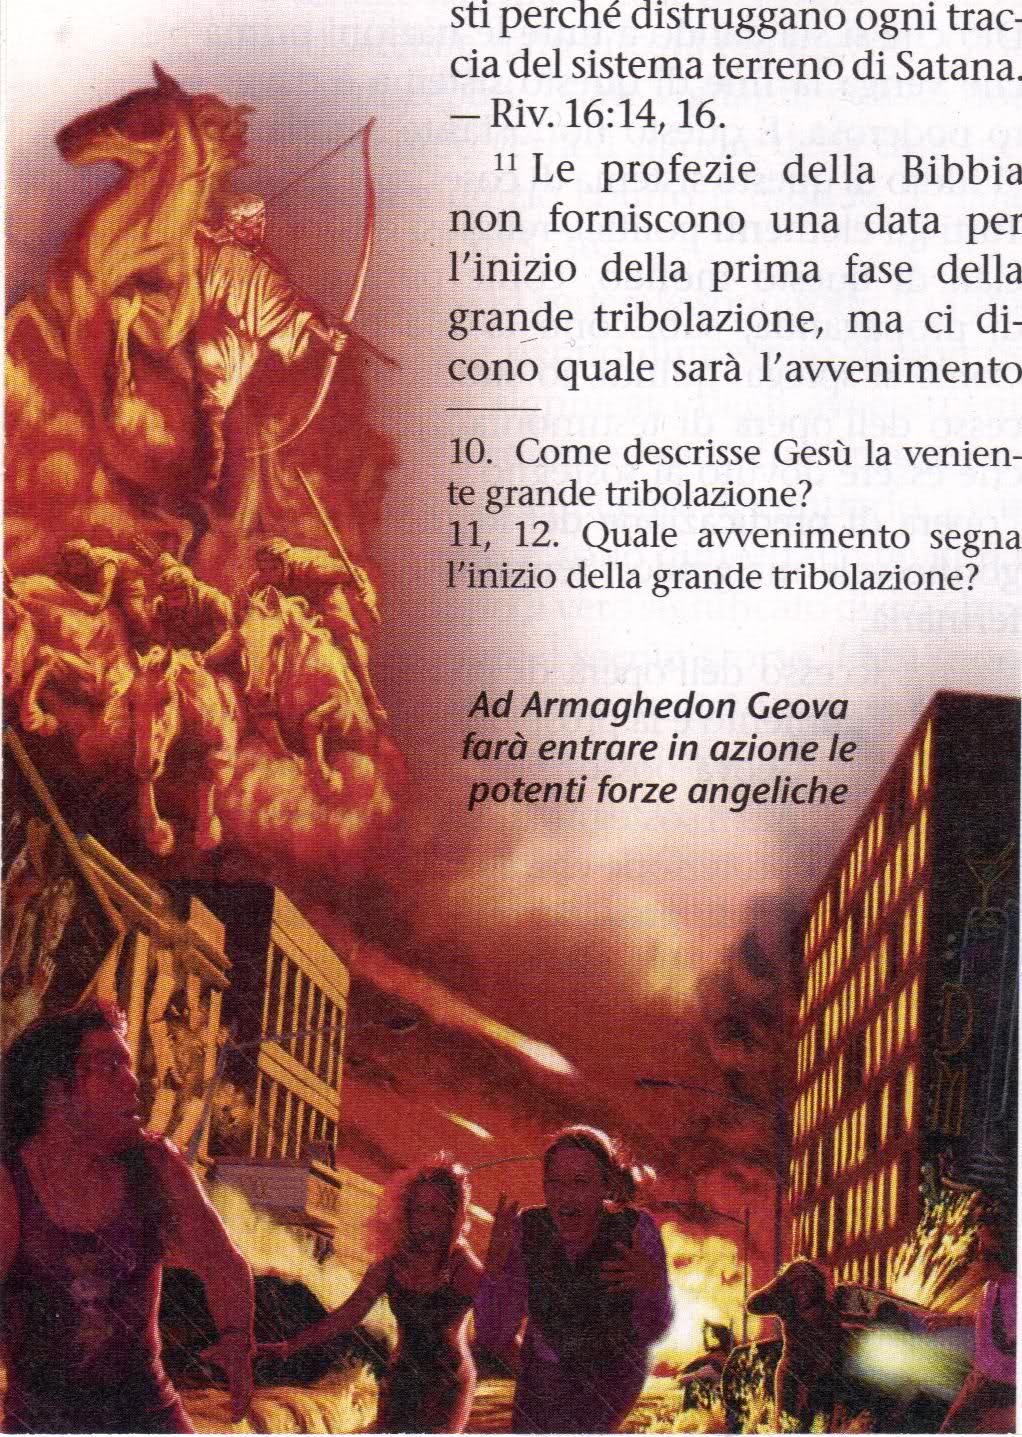 Immagini subliminali a tema satanico nella Torre di Guardia - Pagina 2 2aaeex0